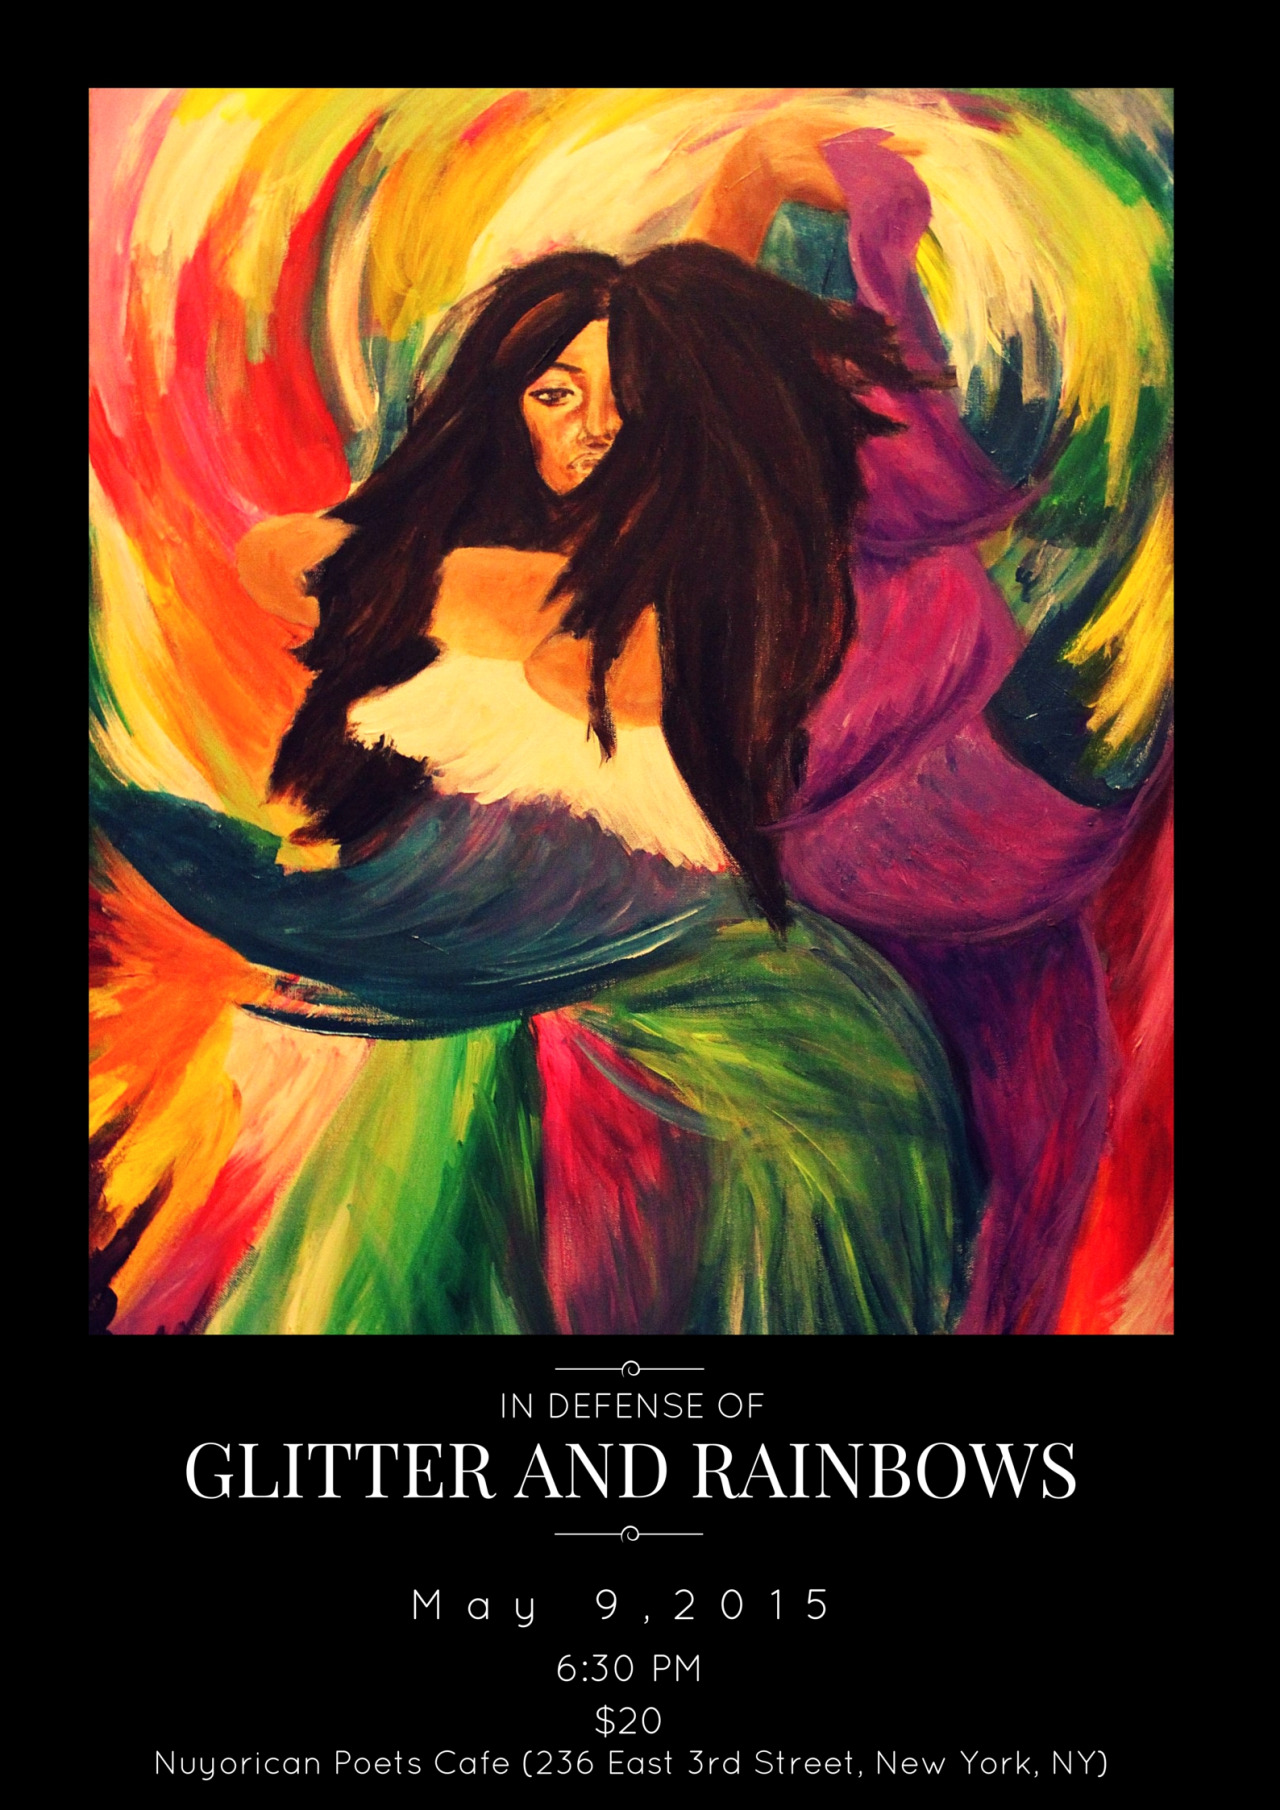 Glitter_RainbowsPoster.jpg